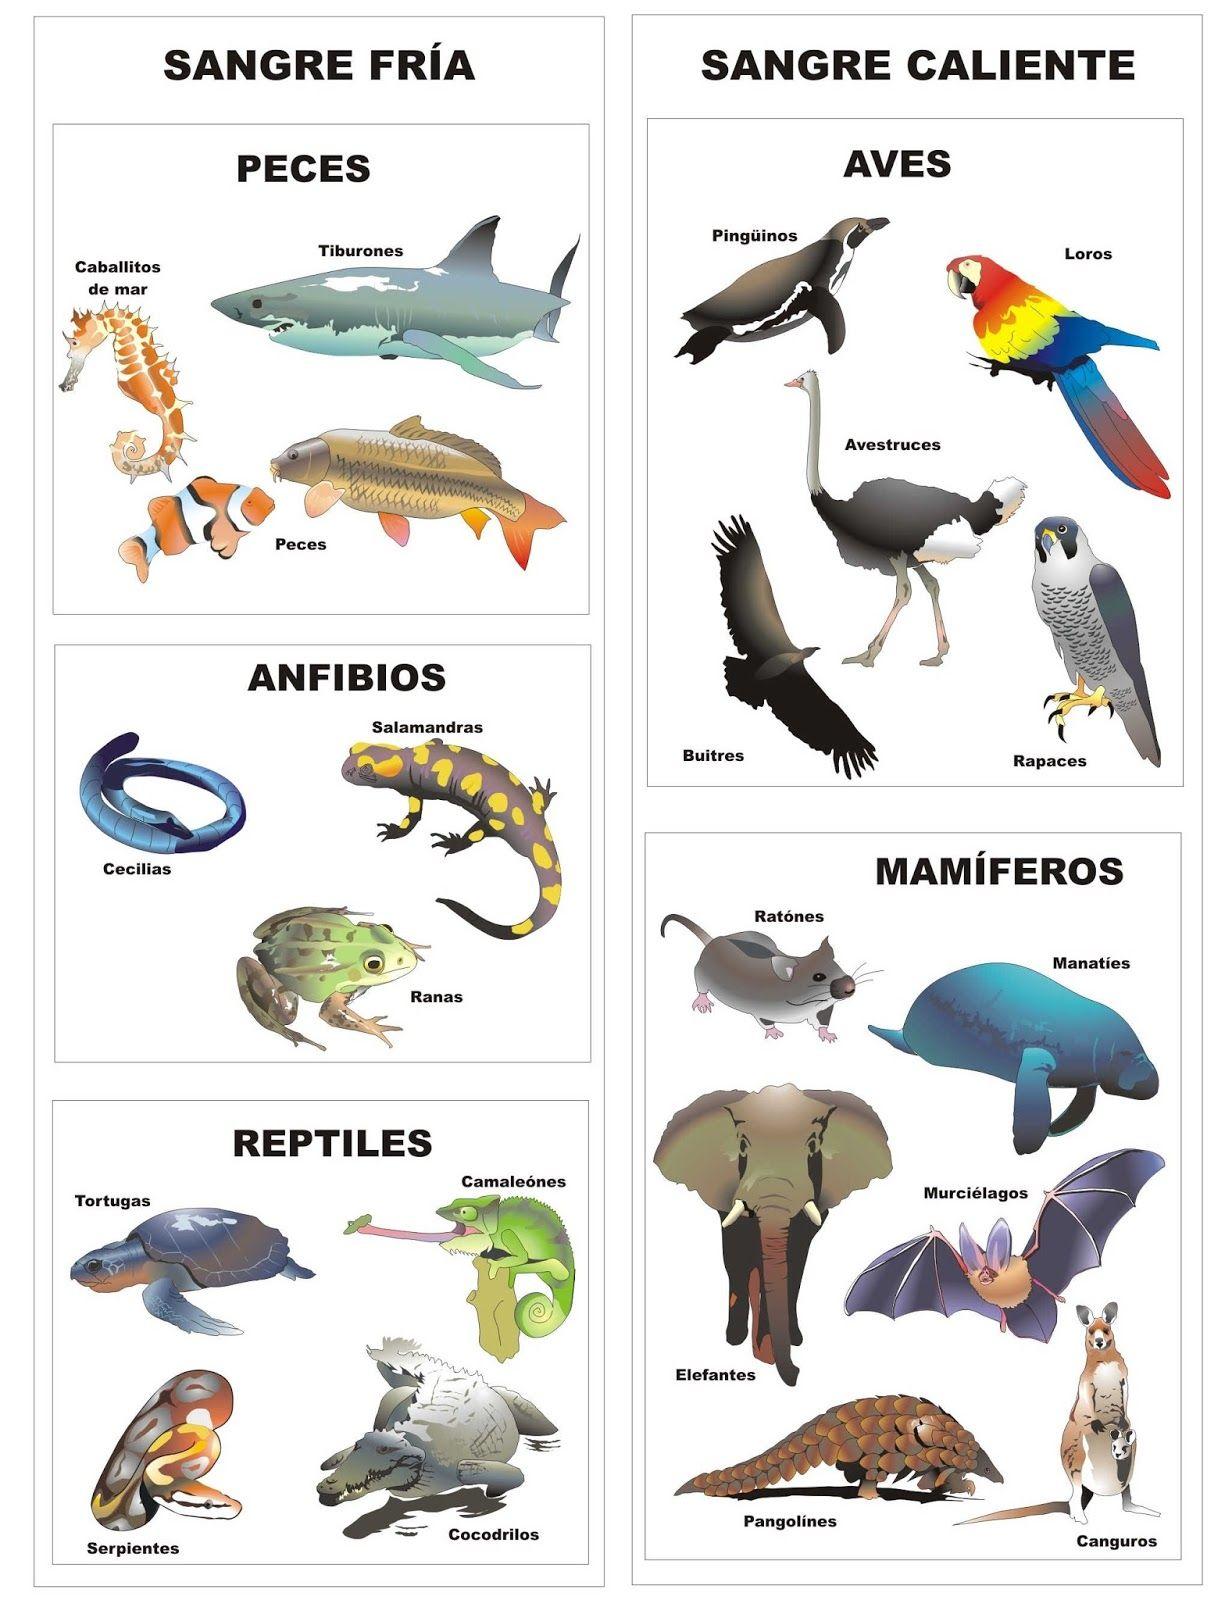 Imgenes de animales vertebrados para imprimir  Material para